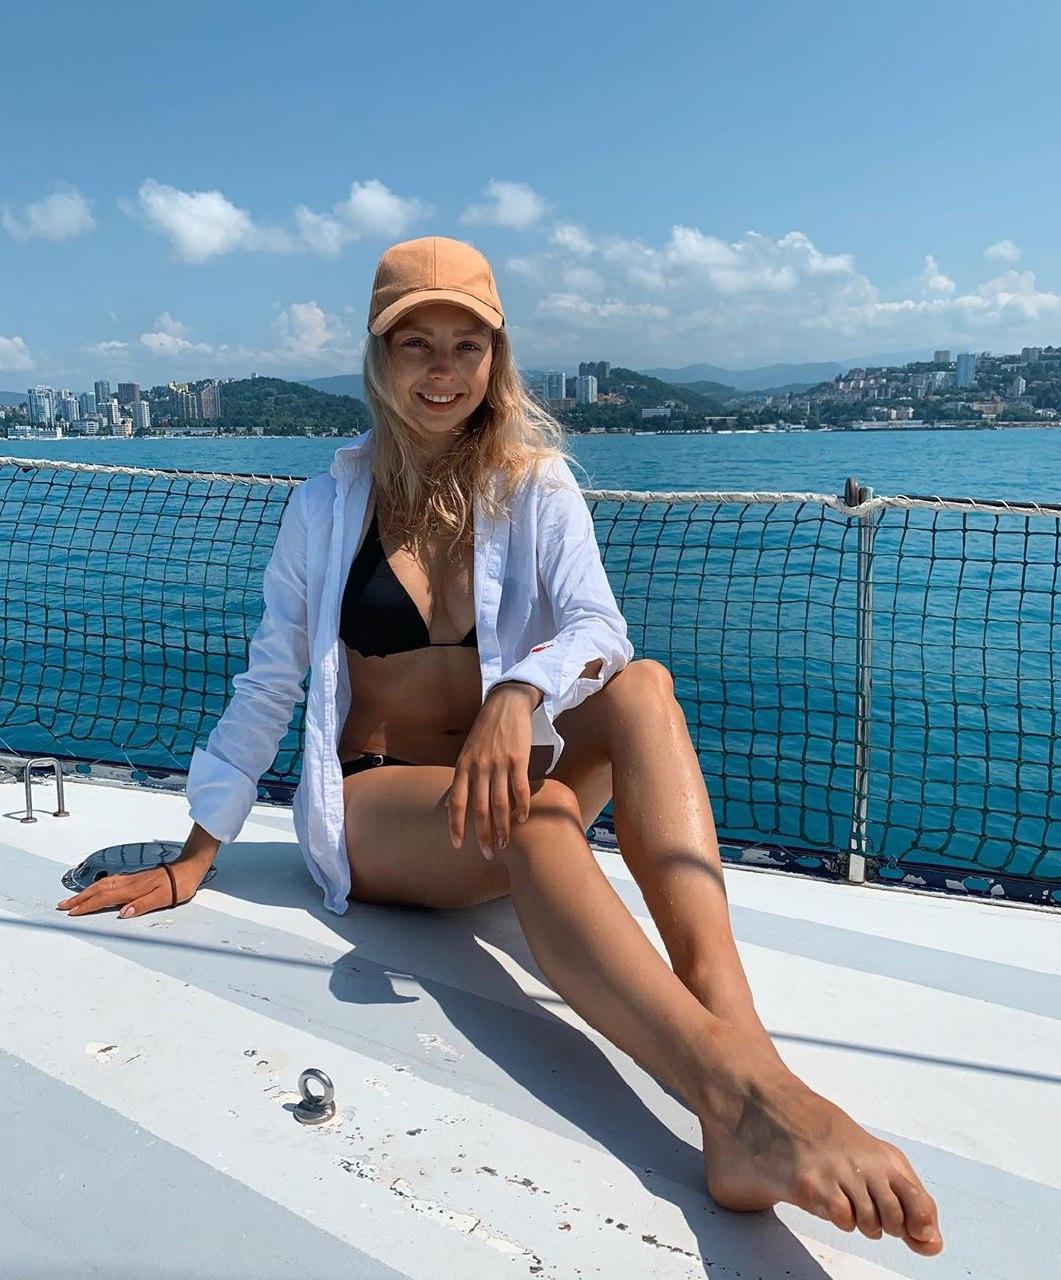 Александра Бойкова-Дмитрий Козловский - Страница 15 7d750a71274499a47b7727bf6b2608df